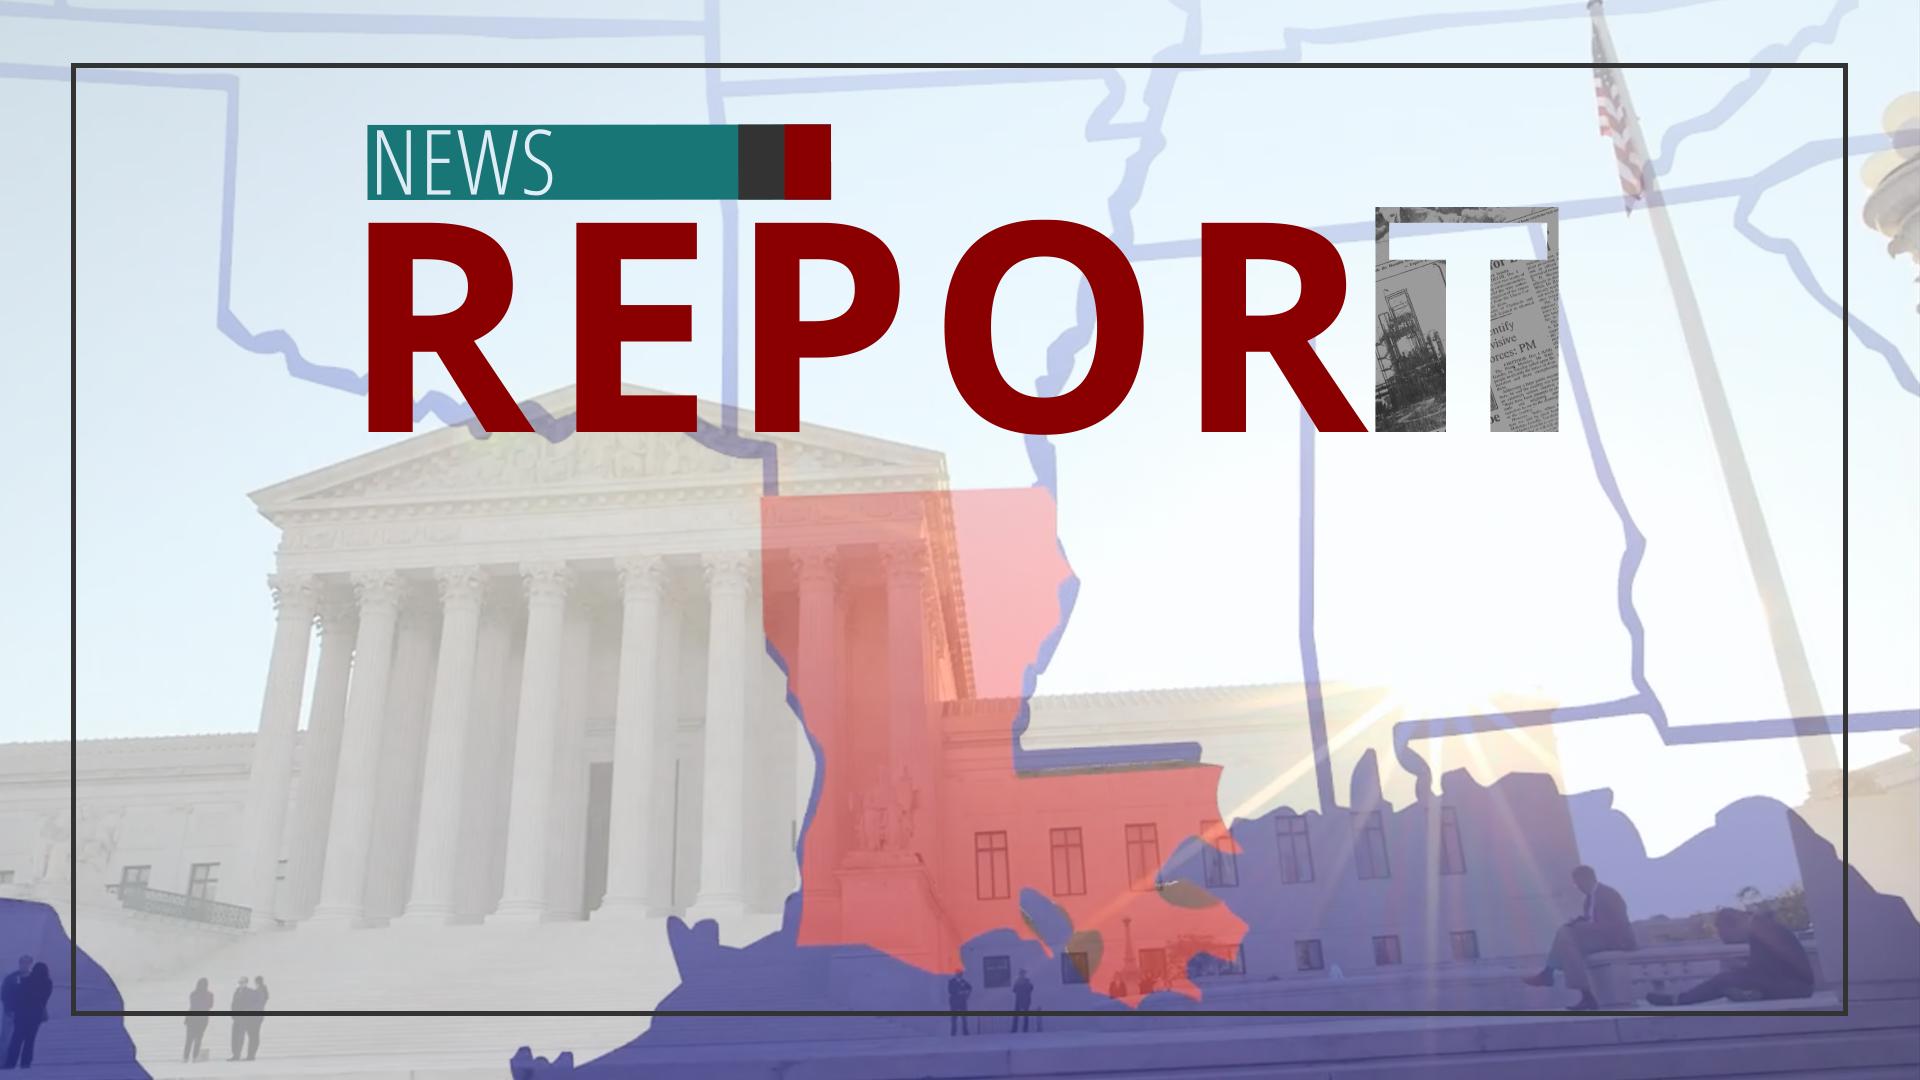 U.S. Supreme Court rejects gun rights case over rapid-fire bump stocks